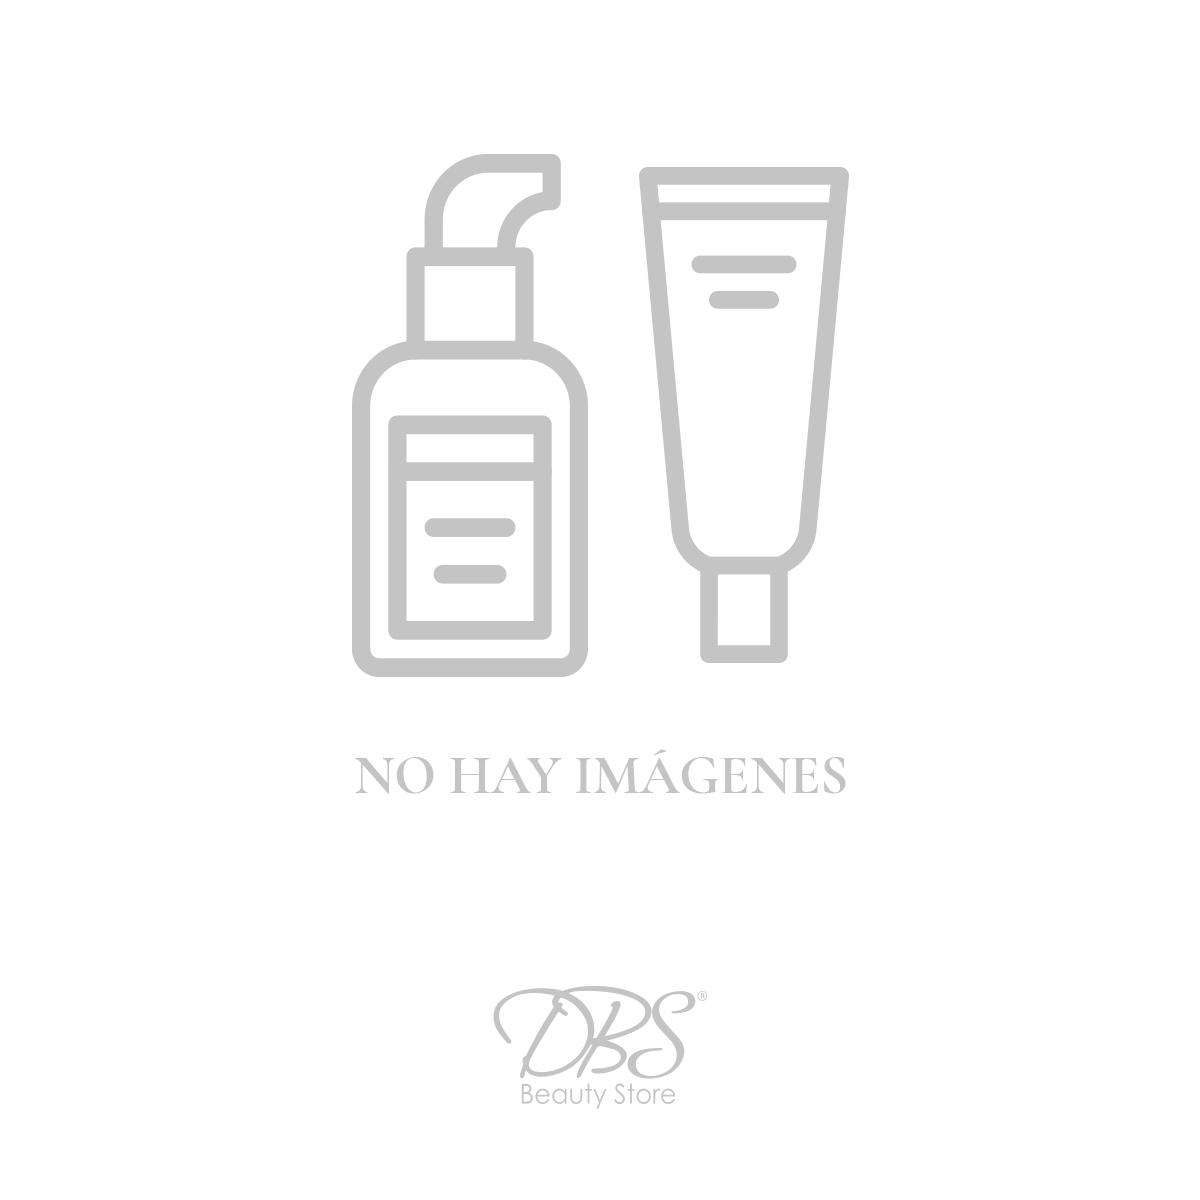 Beauty Box Dbs + Pantone Ii